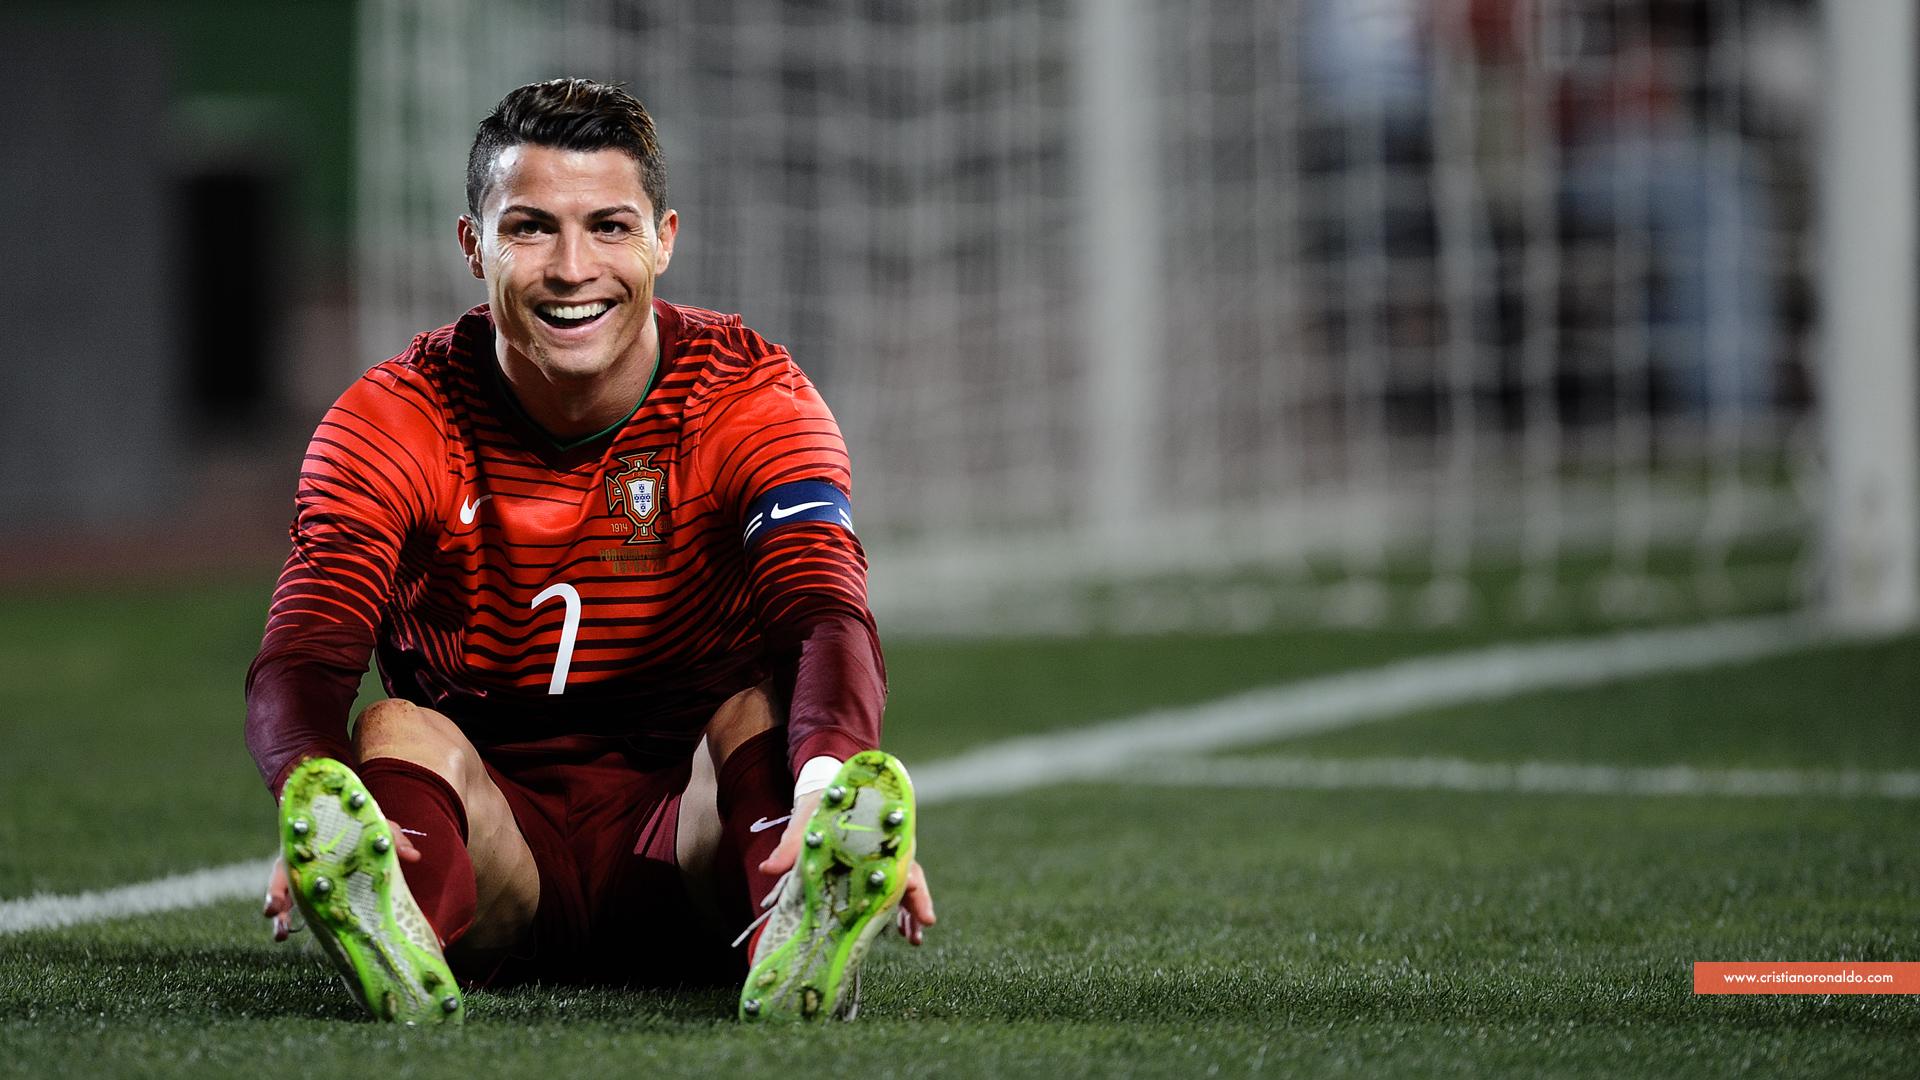 Cristiano Ronaldo 2014 Wallpapers Full HD Sporteology 1920x1080